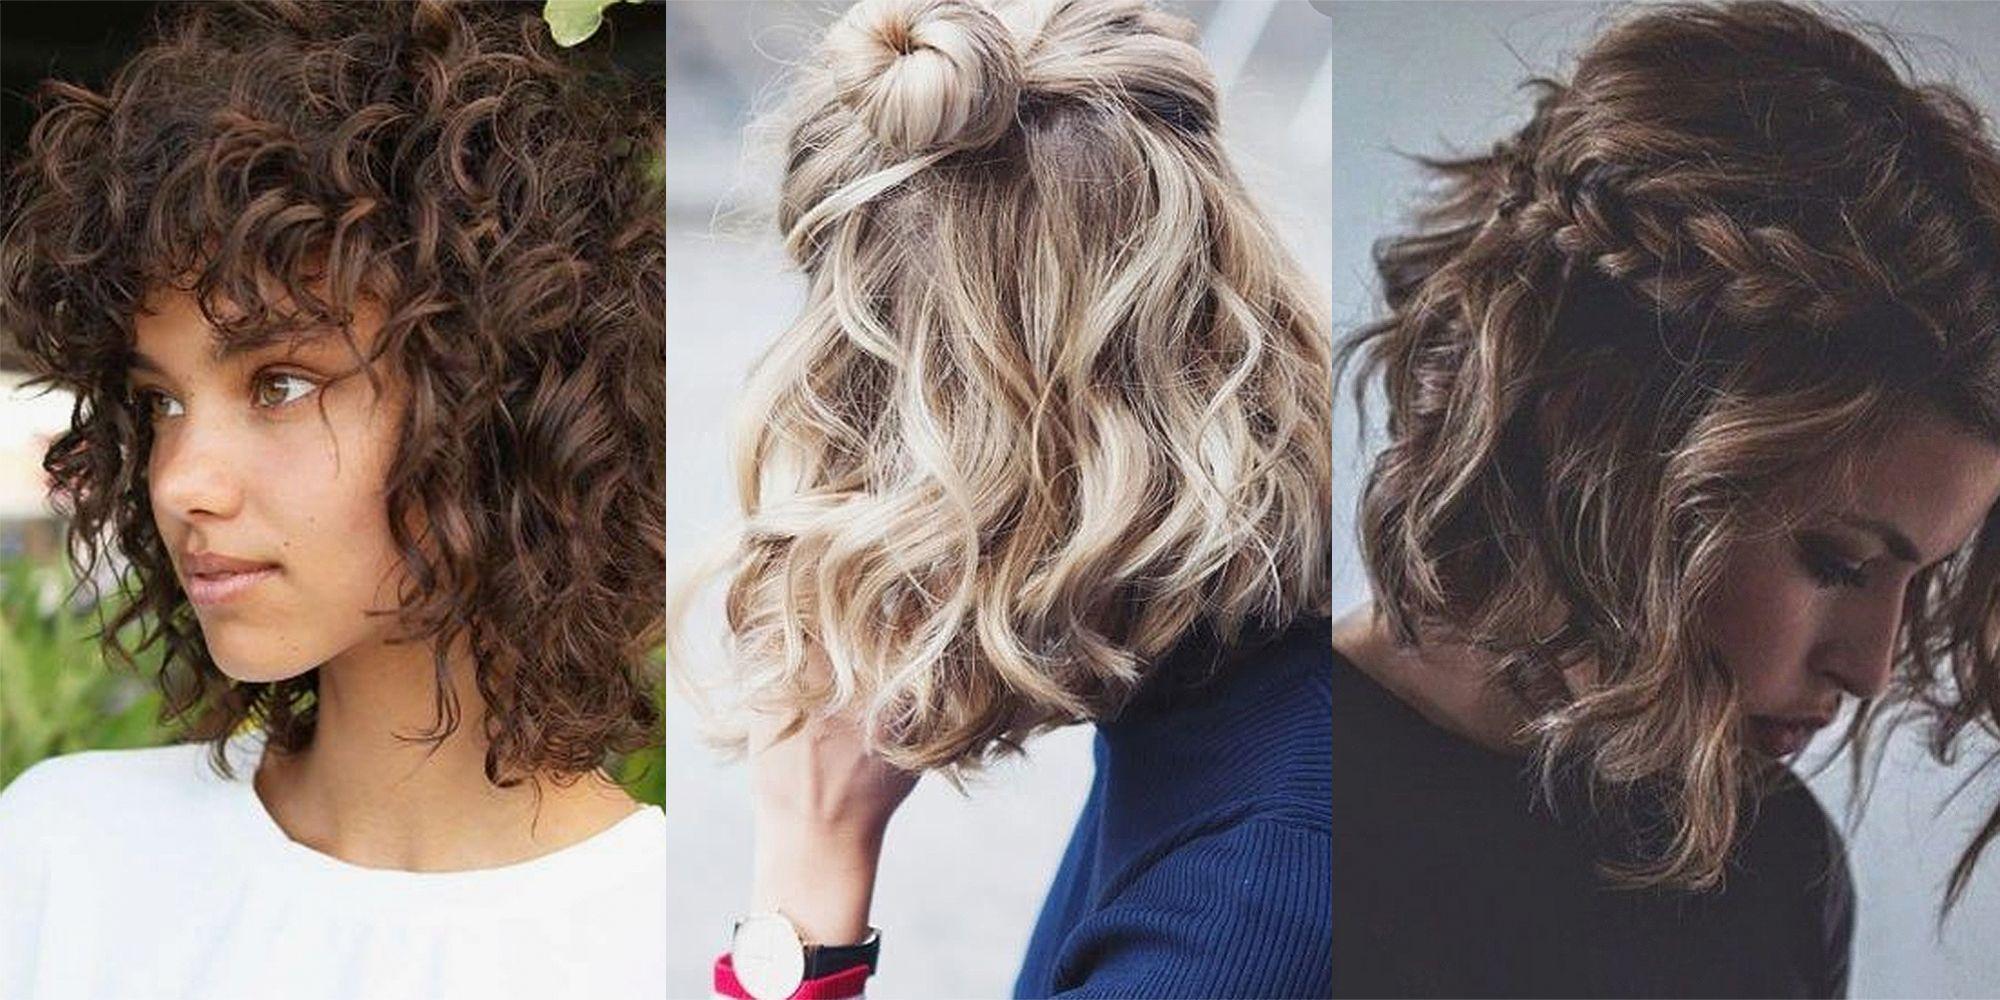 Peinados en cabello corto recogido para fiesta